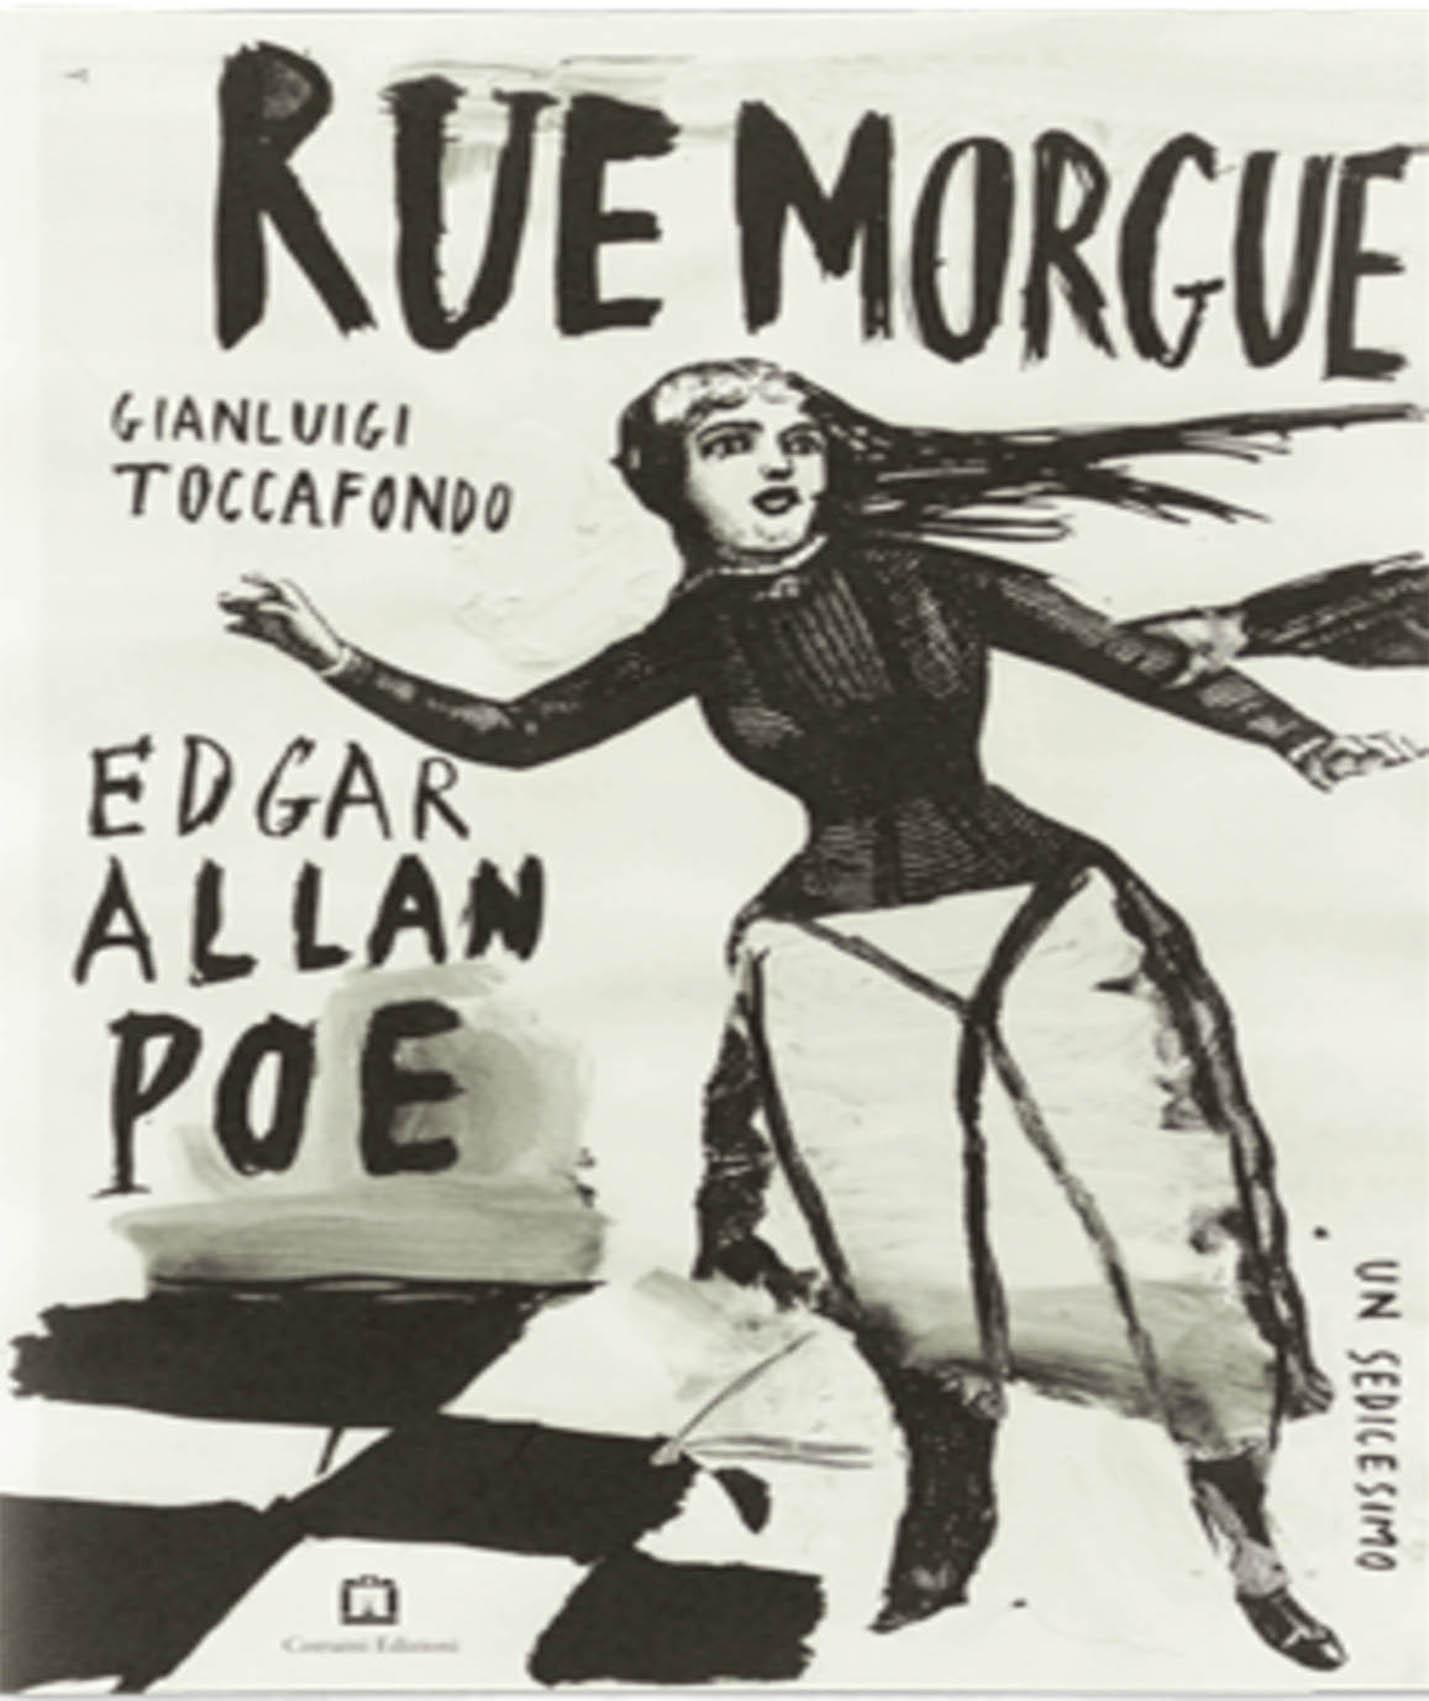 ``Rue Morgue`` Gianluigi Toccafondo - illustration